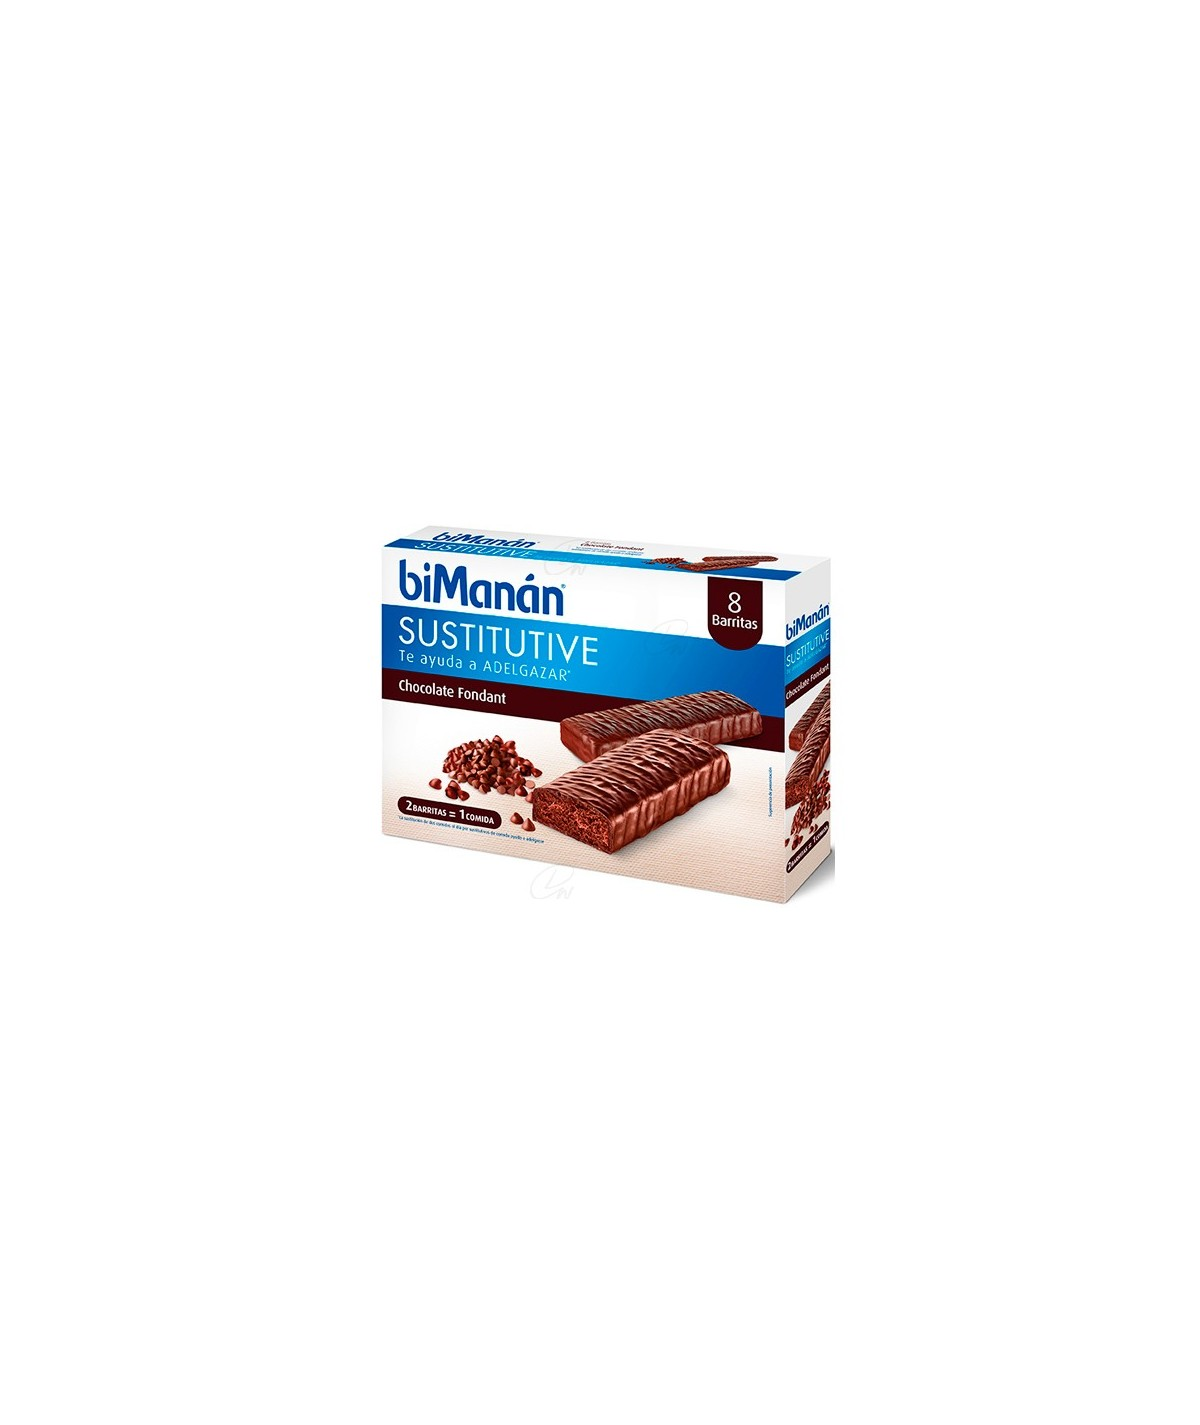 BIMANAN BARRITA CHOCOLATE NEGRO FONDANT 40 G 320 G 8 BAR